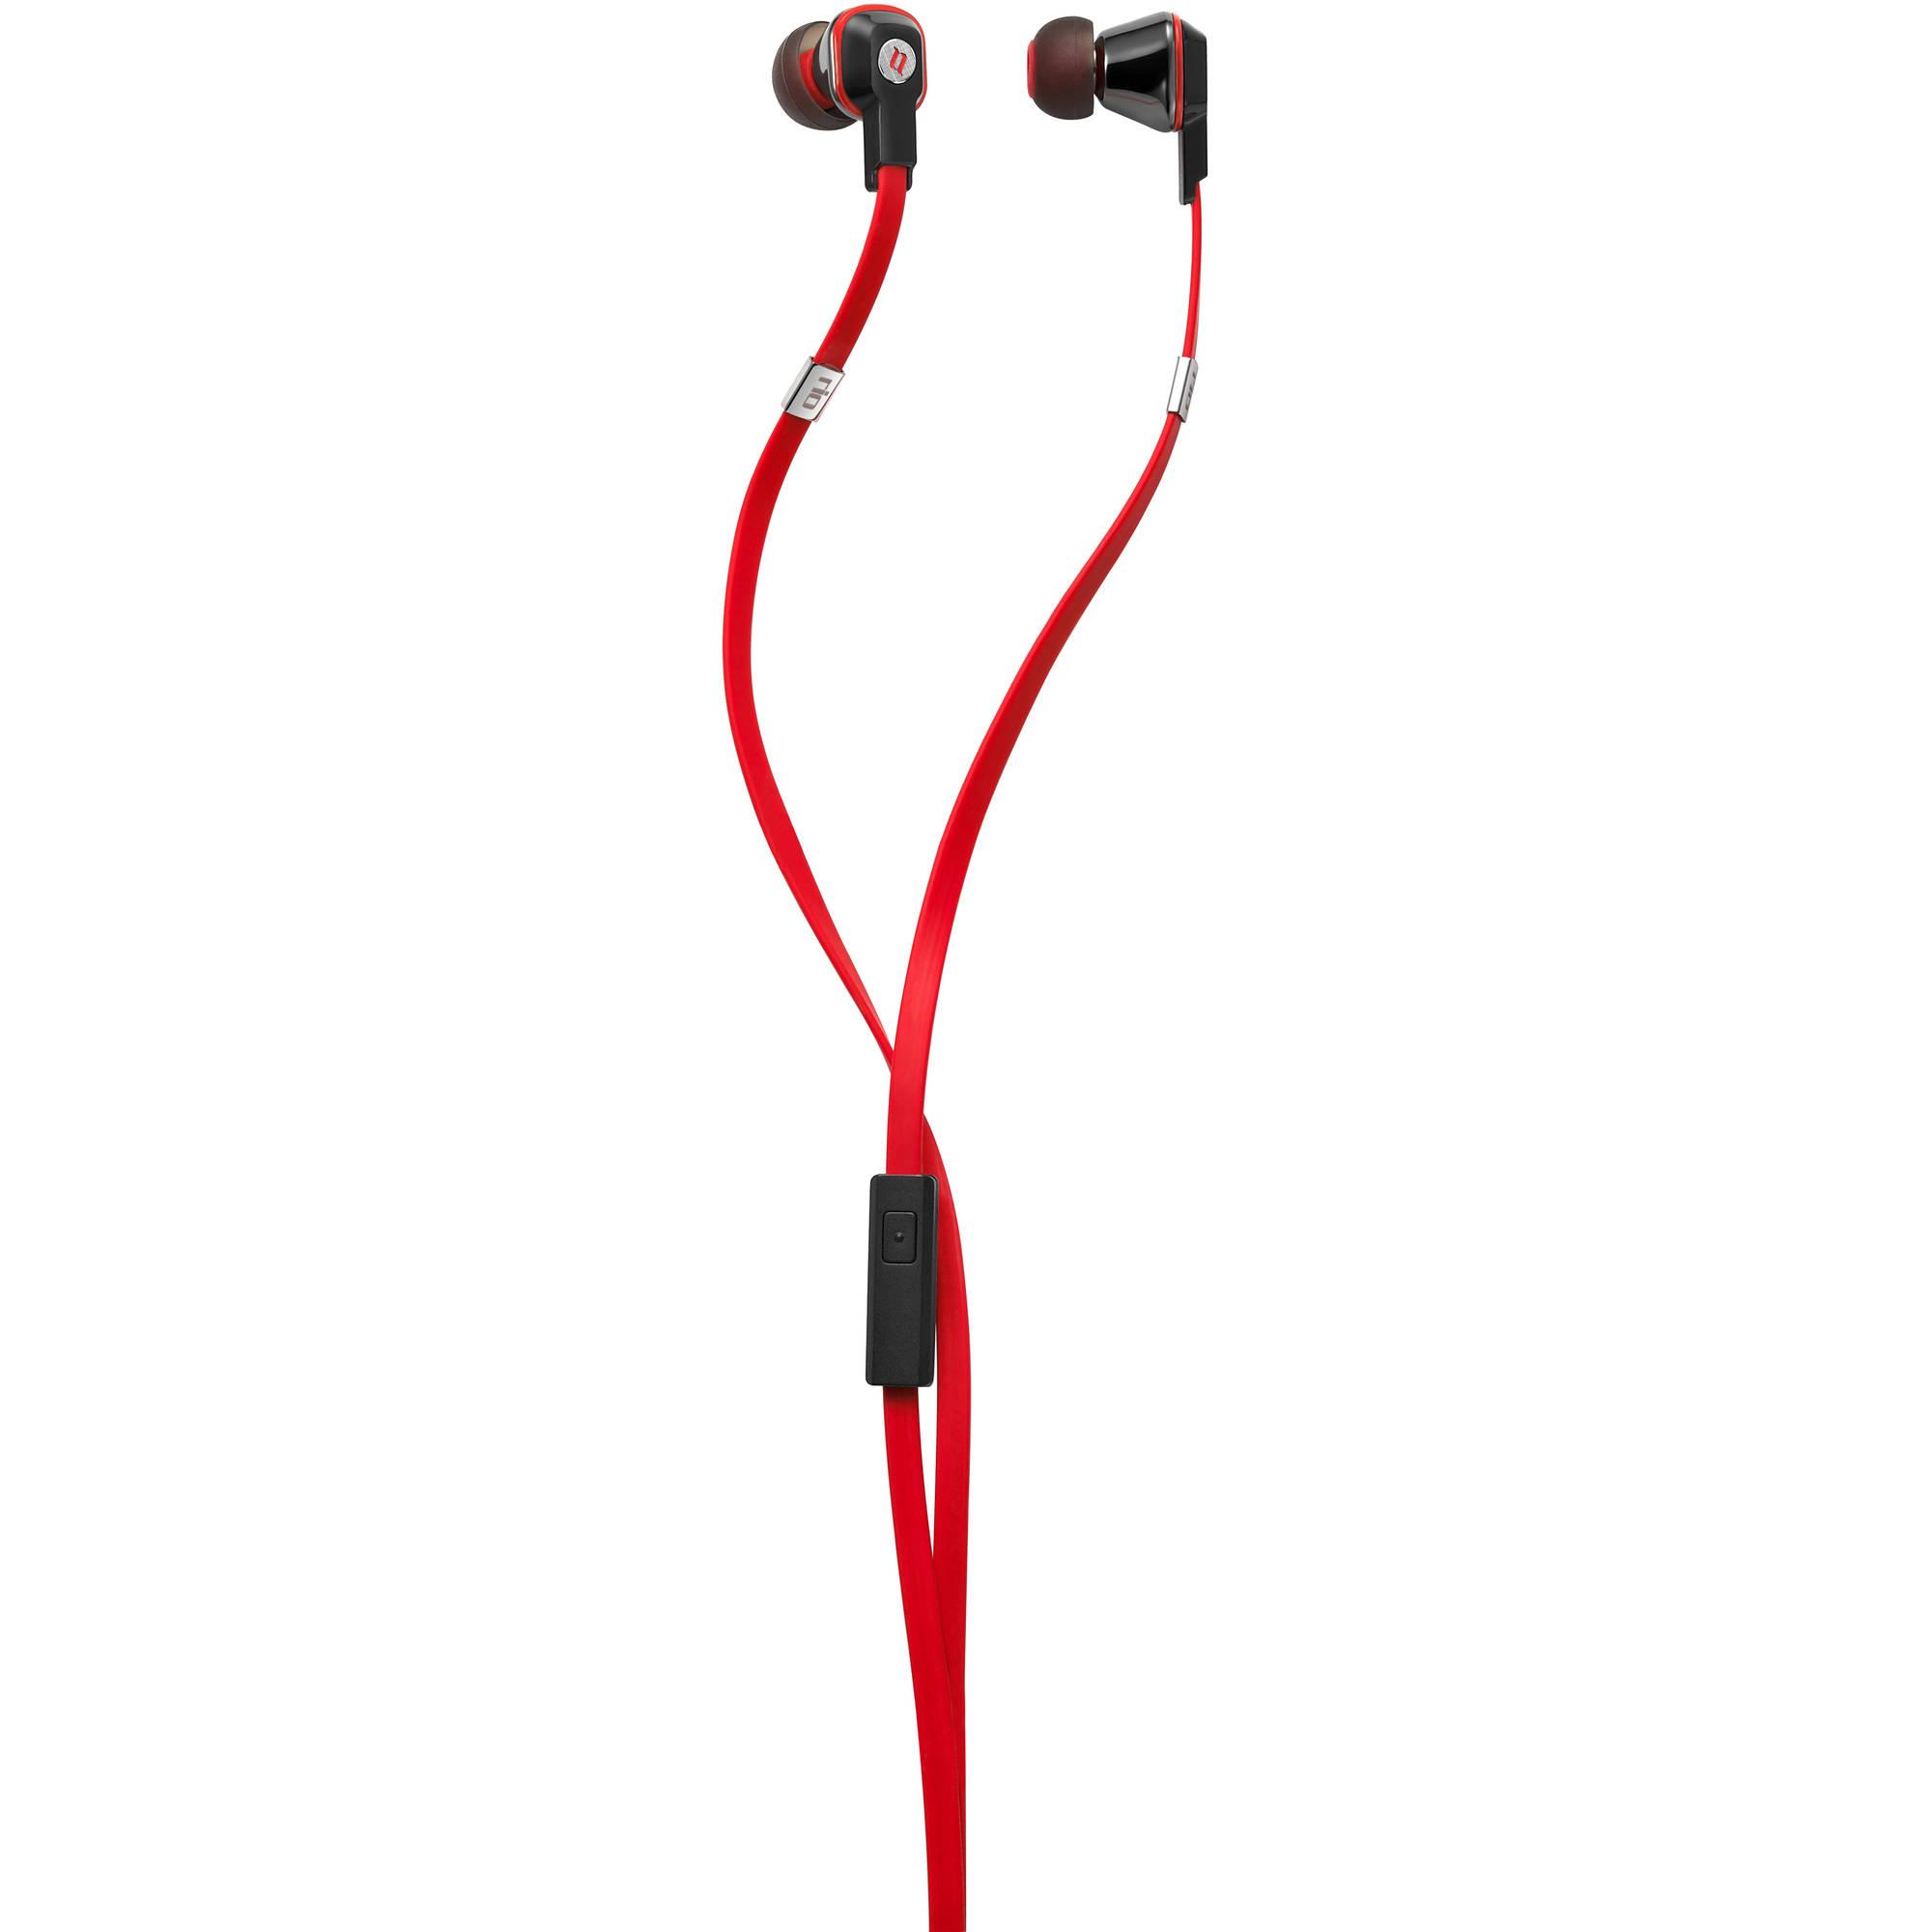 Noontec Rio Fashion In-Ear Headphones, Red